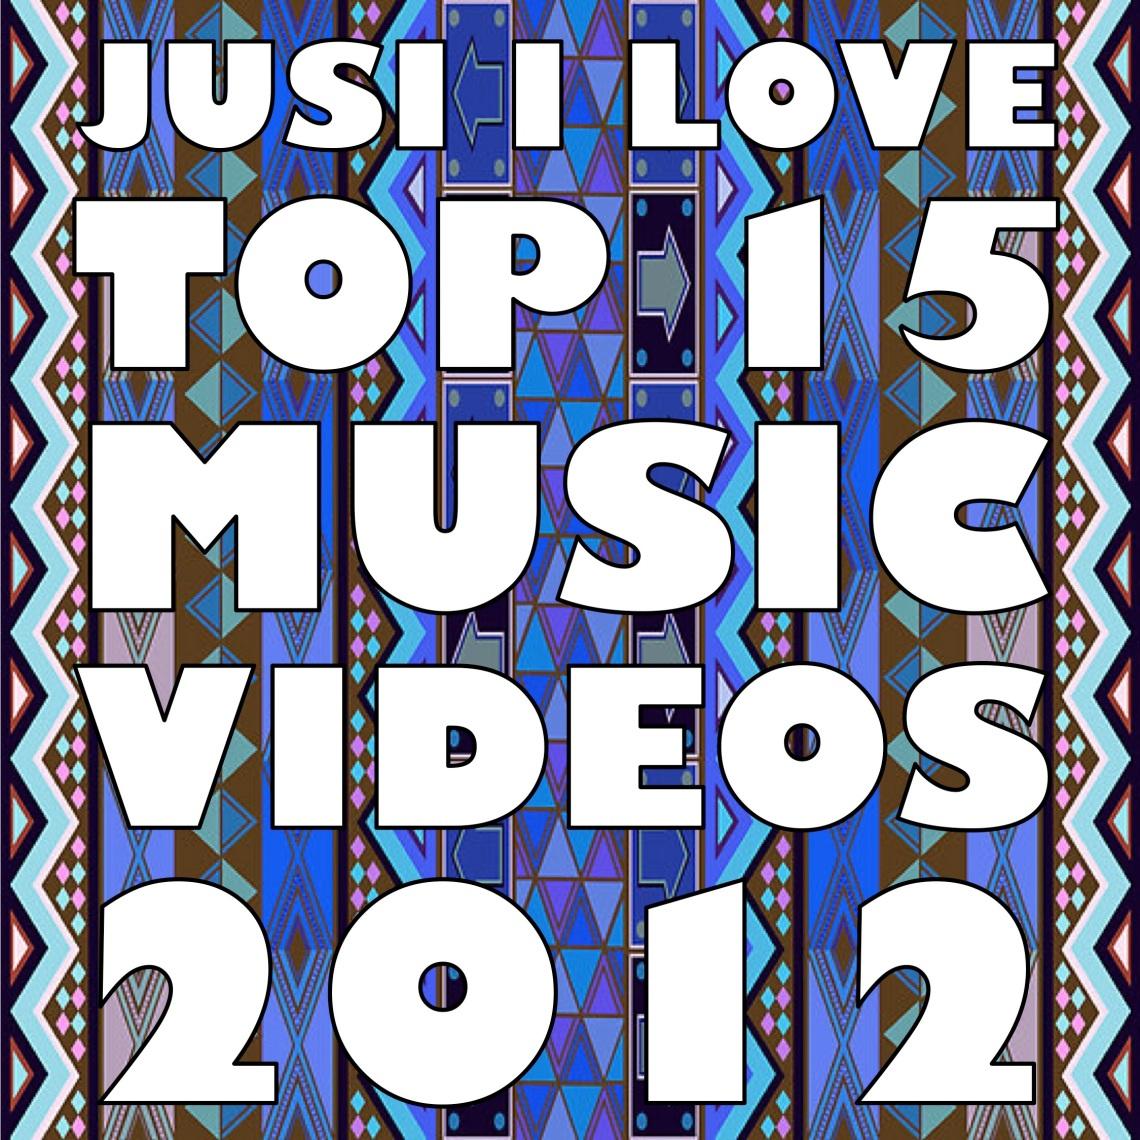 TOP 15 MUSIC VIDEOS